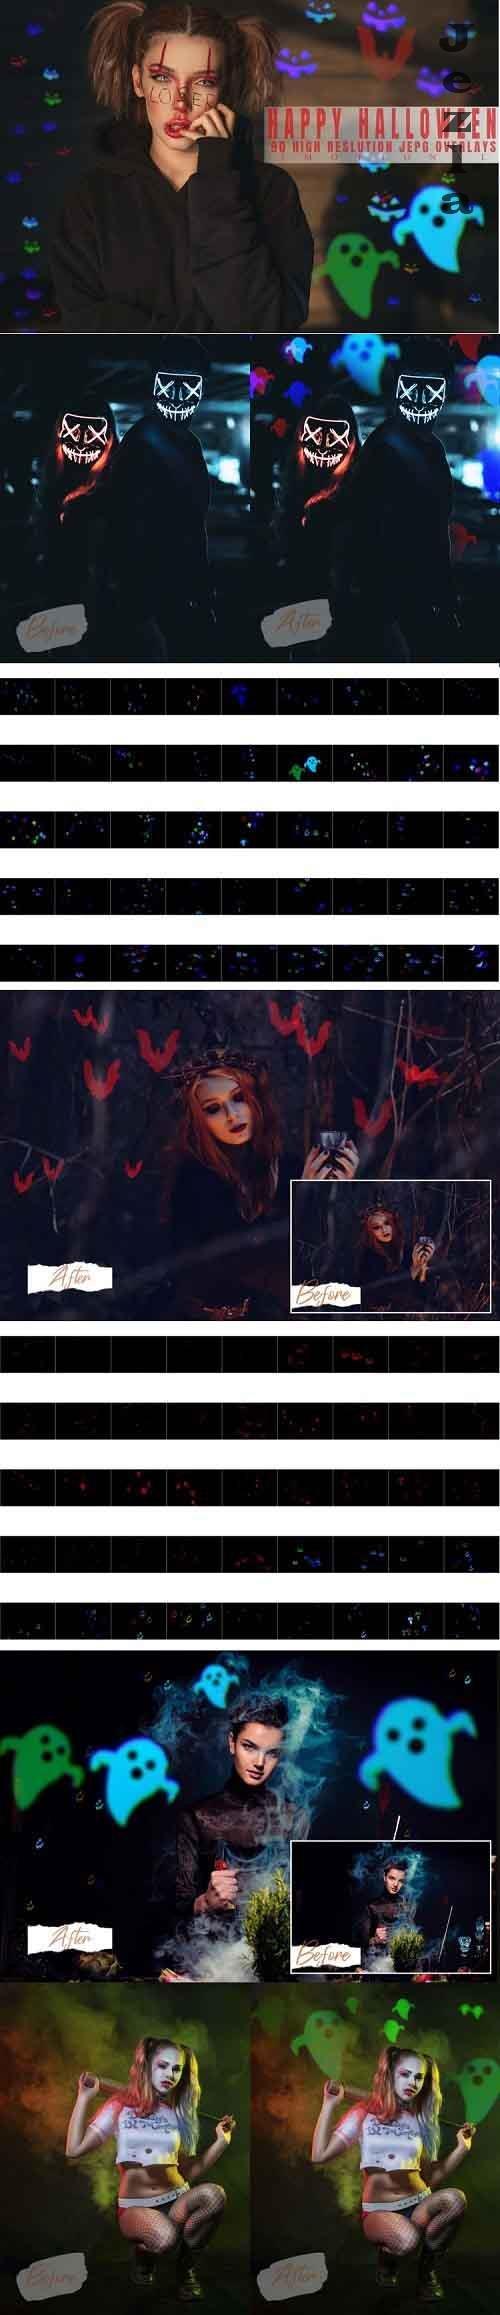 90 Happy Halloween Bokeh Overlays - 887618